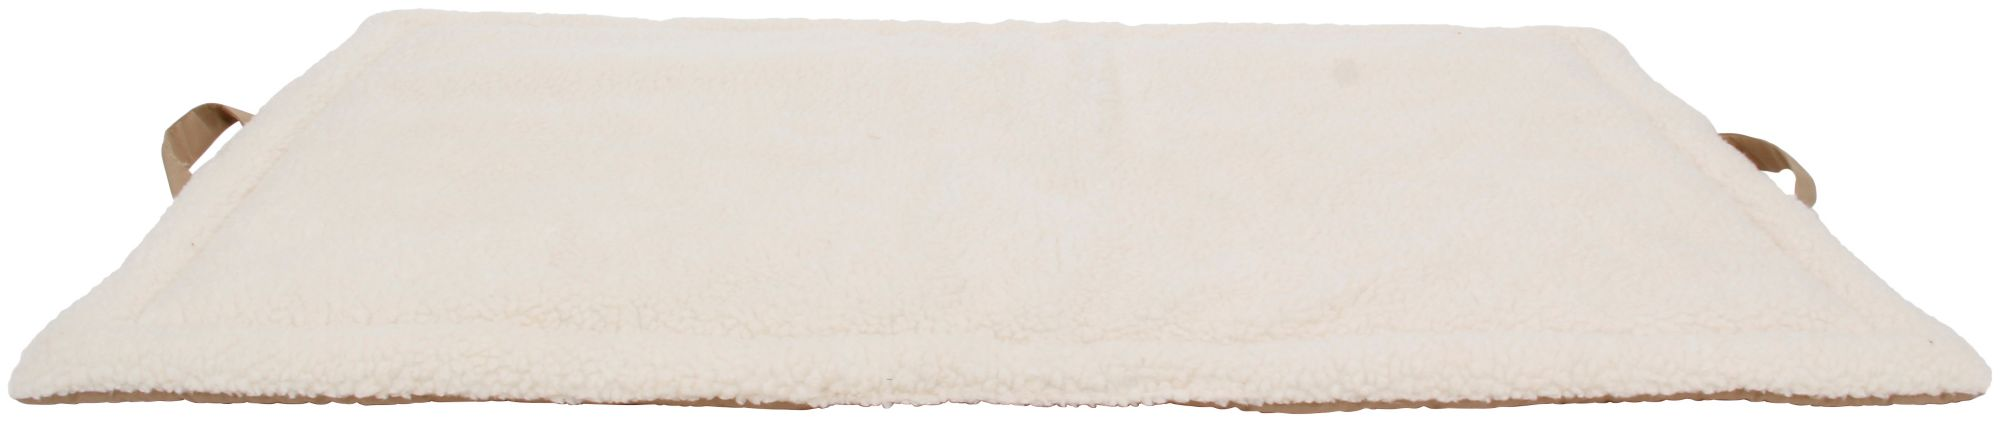 HEIM  Hunde-Decke »Patchwork«, BxT: 60x80 cm, gesteppt, beige